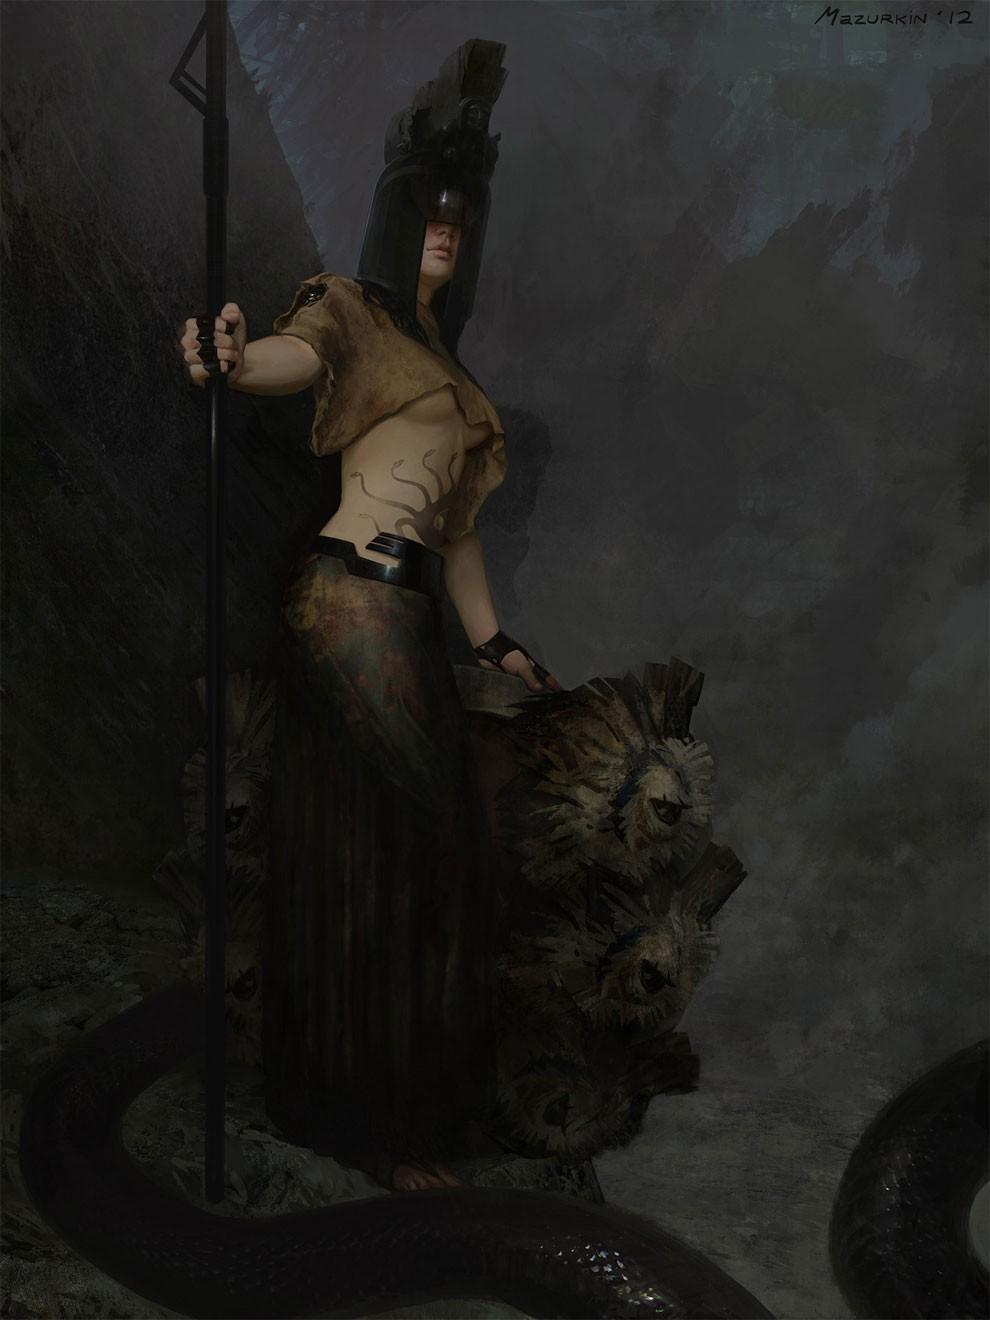 digital-art-dark-fantasy-horror-yuriy-mazurkin-04